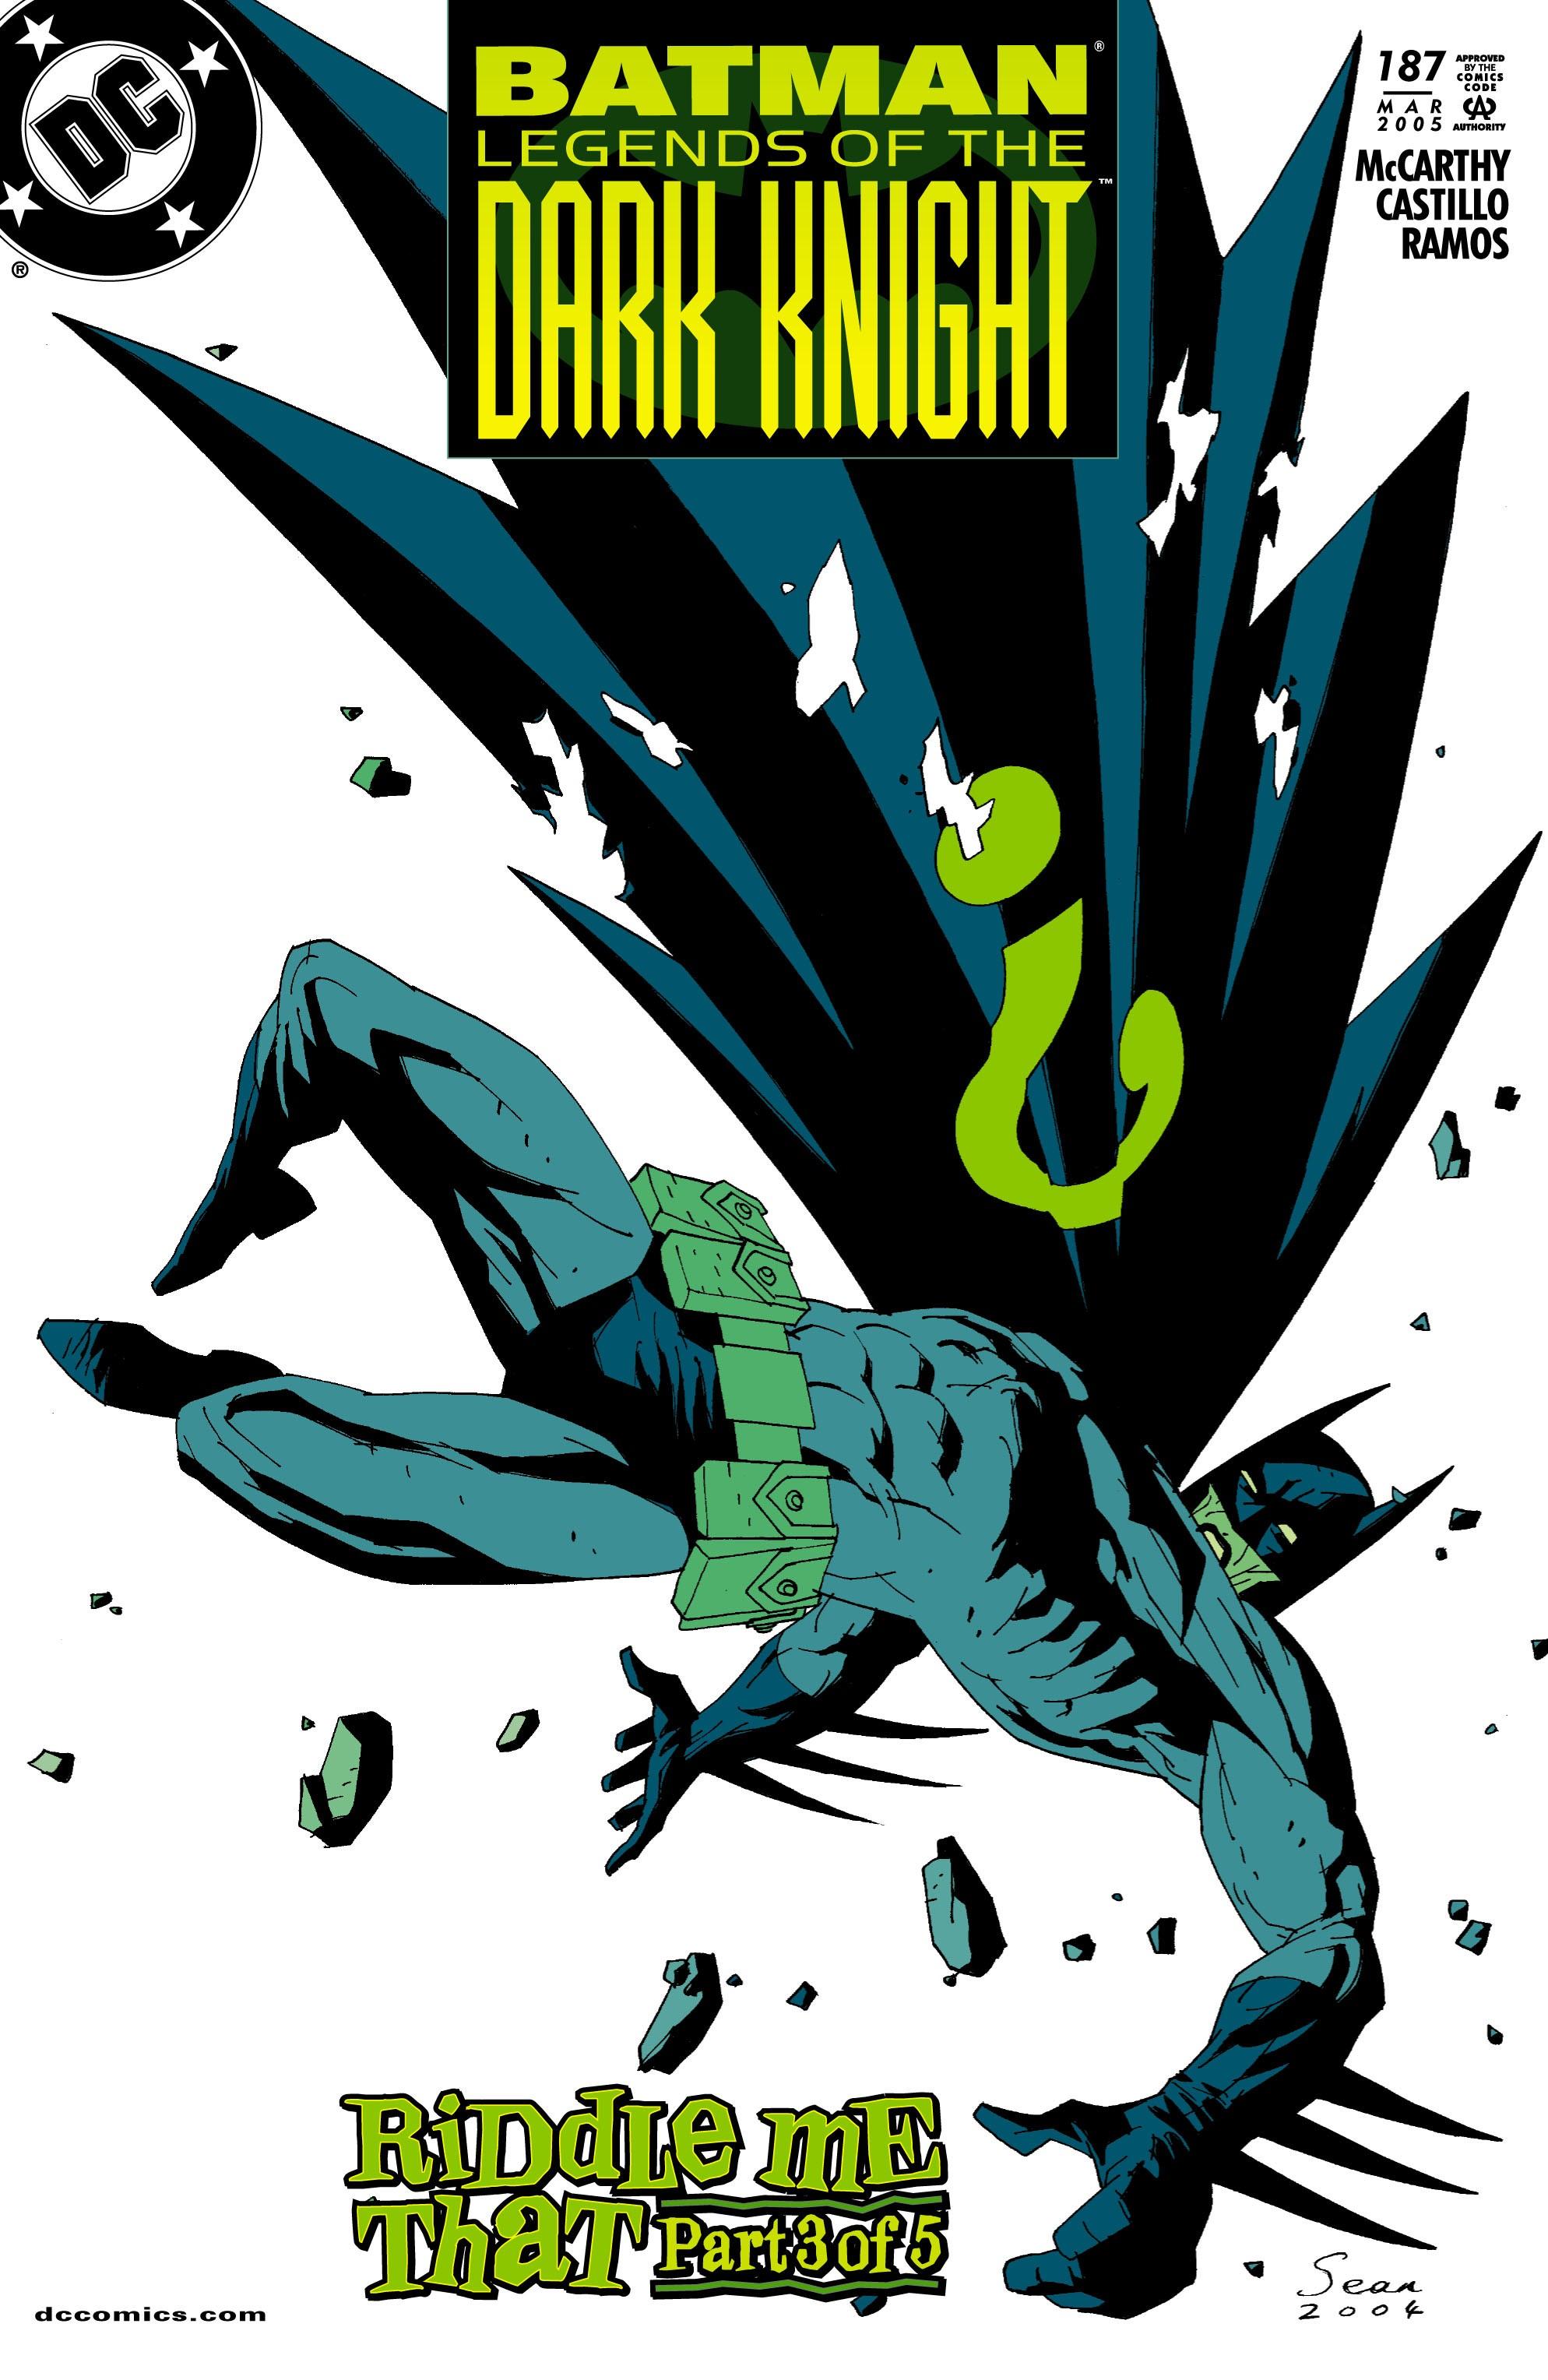 Batman: Legends of the Dark Knight 187 Page 1